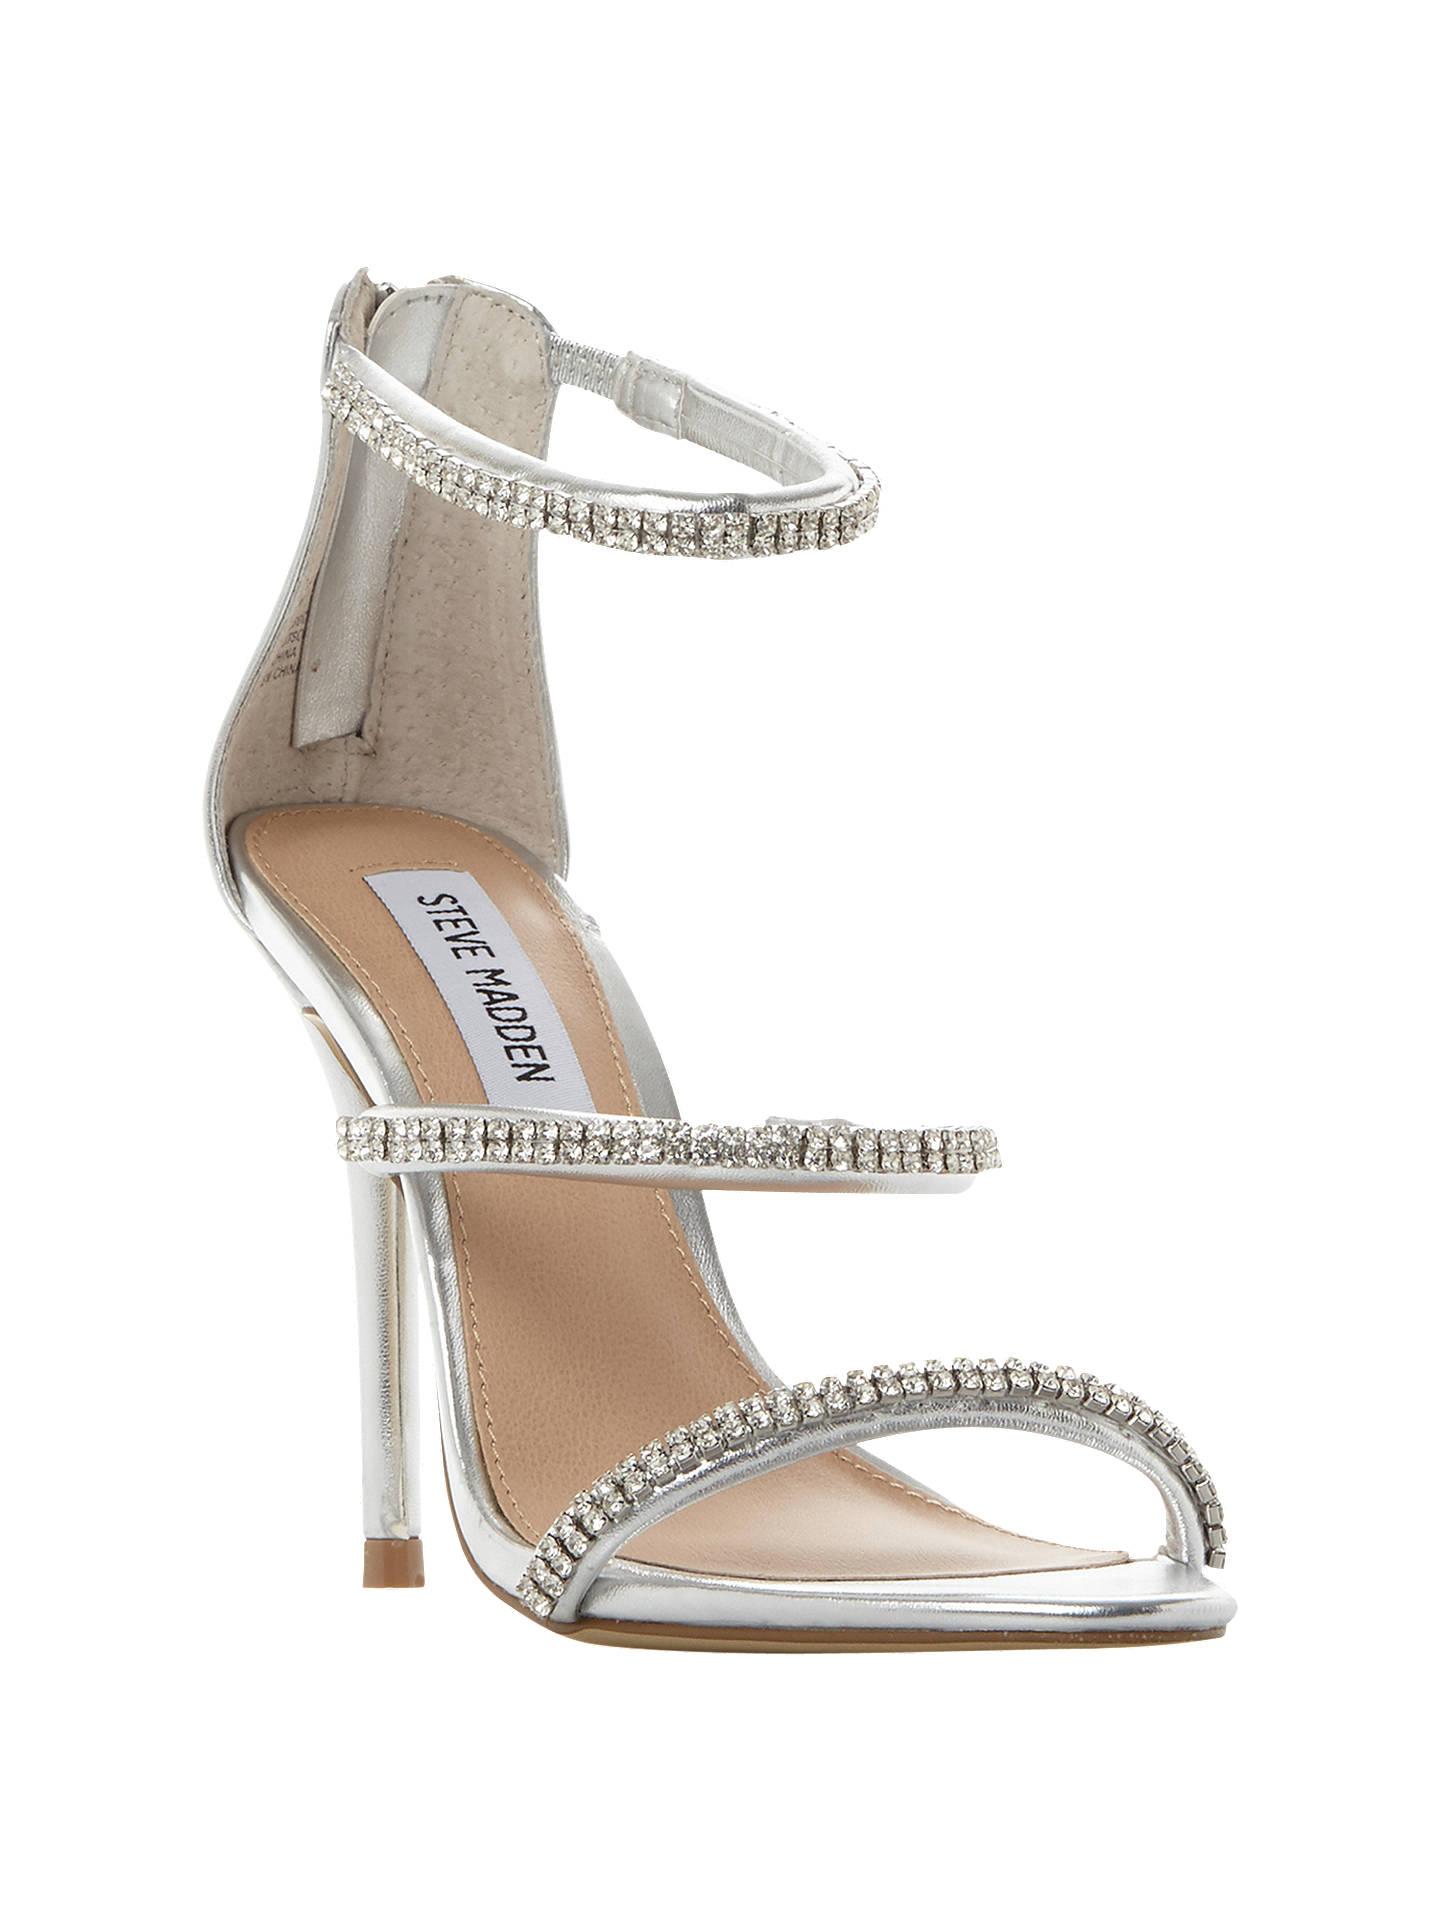 479aa0cc87 Buy Steve Madden Wren-R SM Jewelled Strap Stiletto Sandals, Silver, 5  Online ...